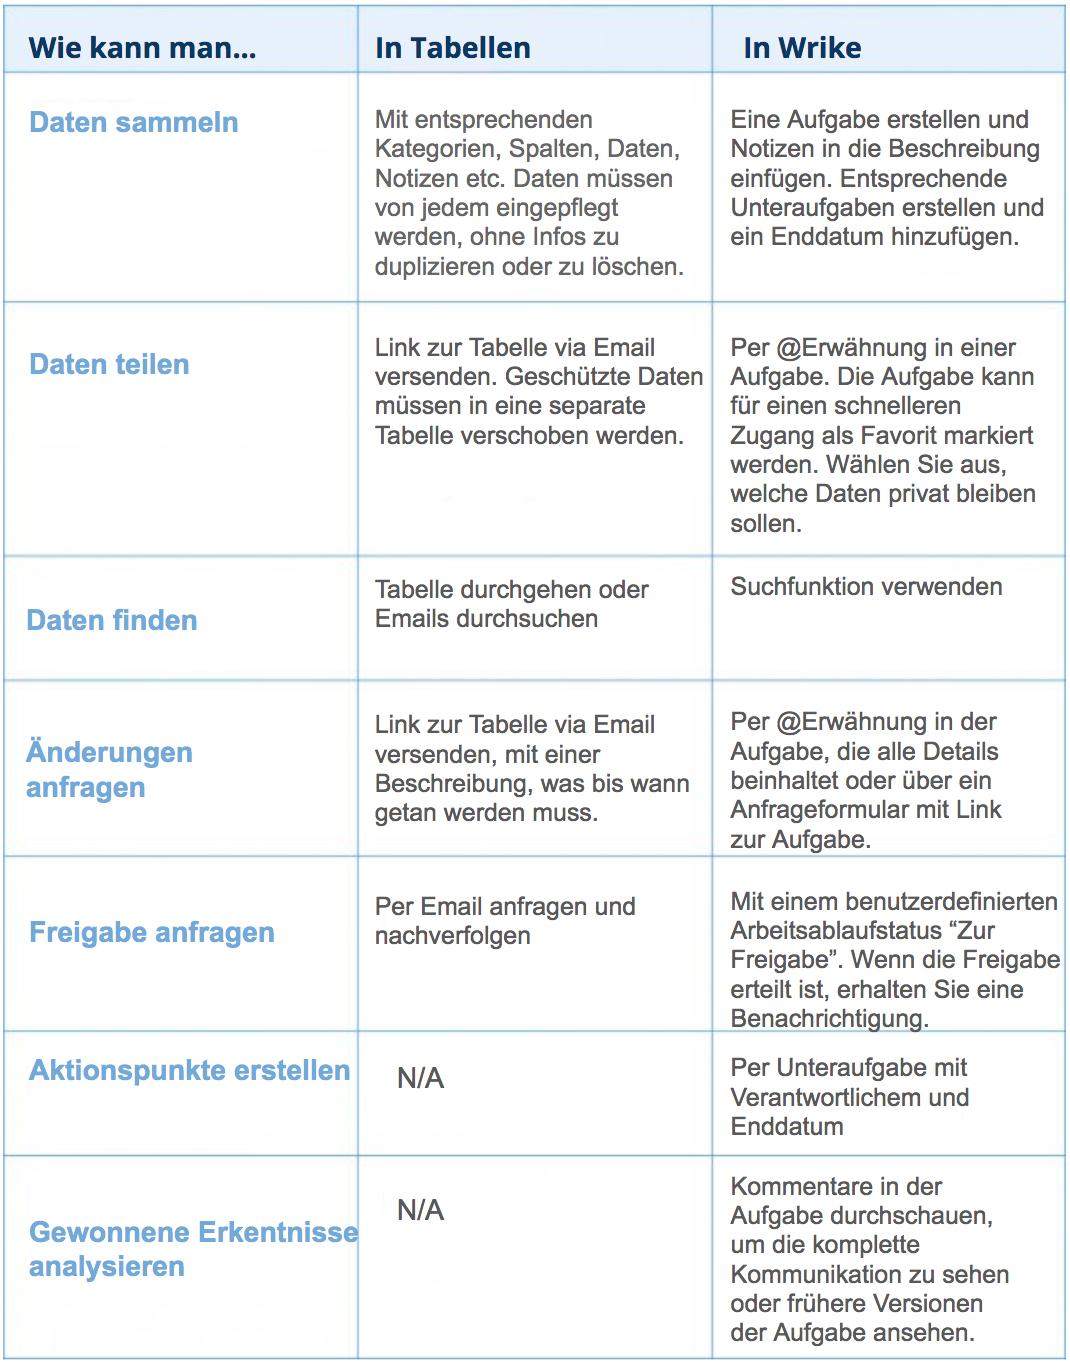 Vergleich Tabelle Wrike